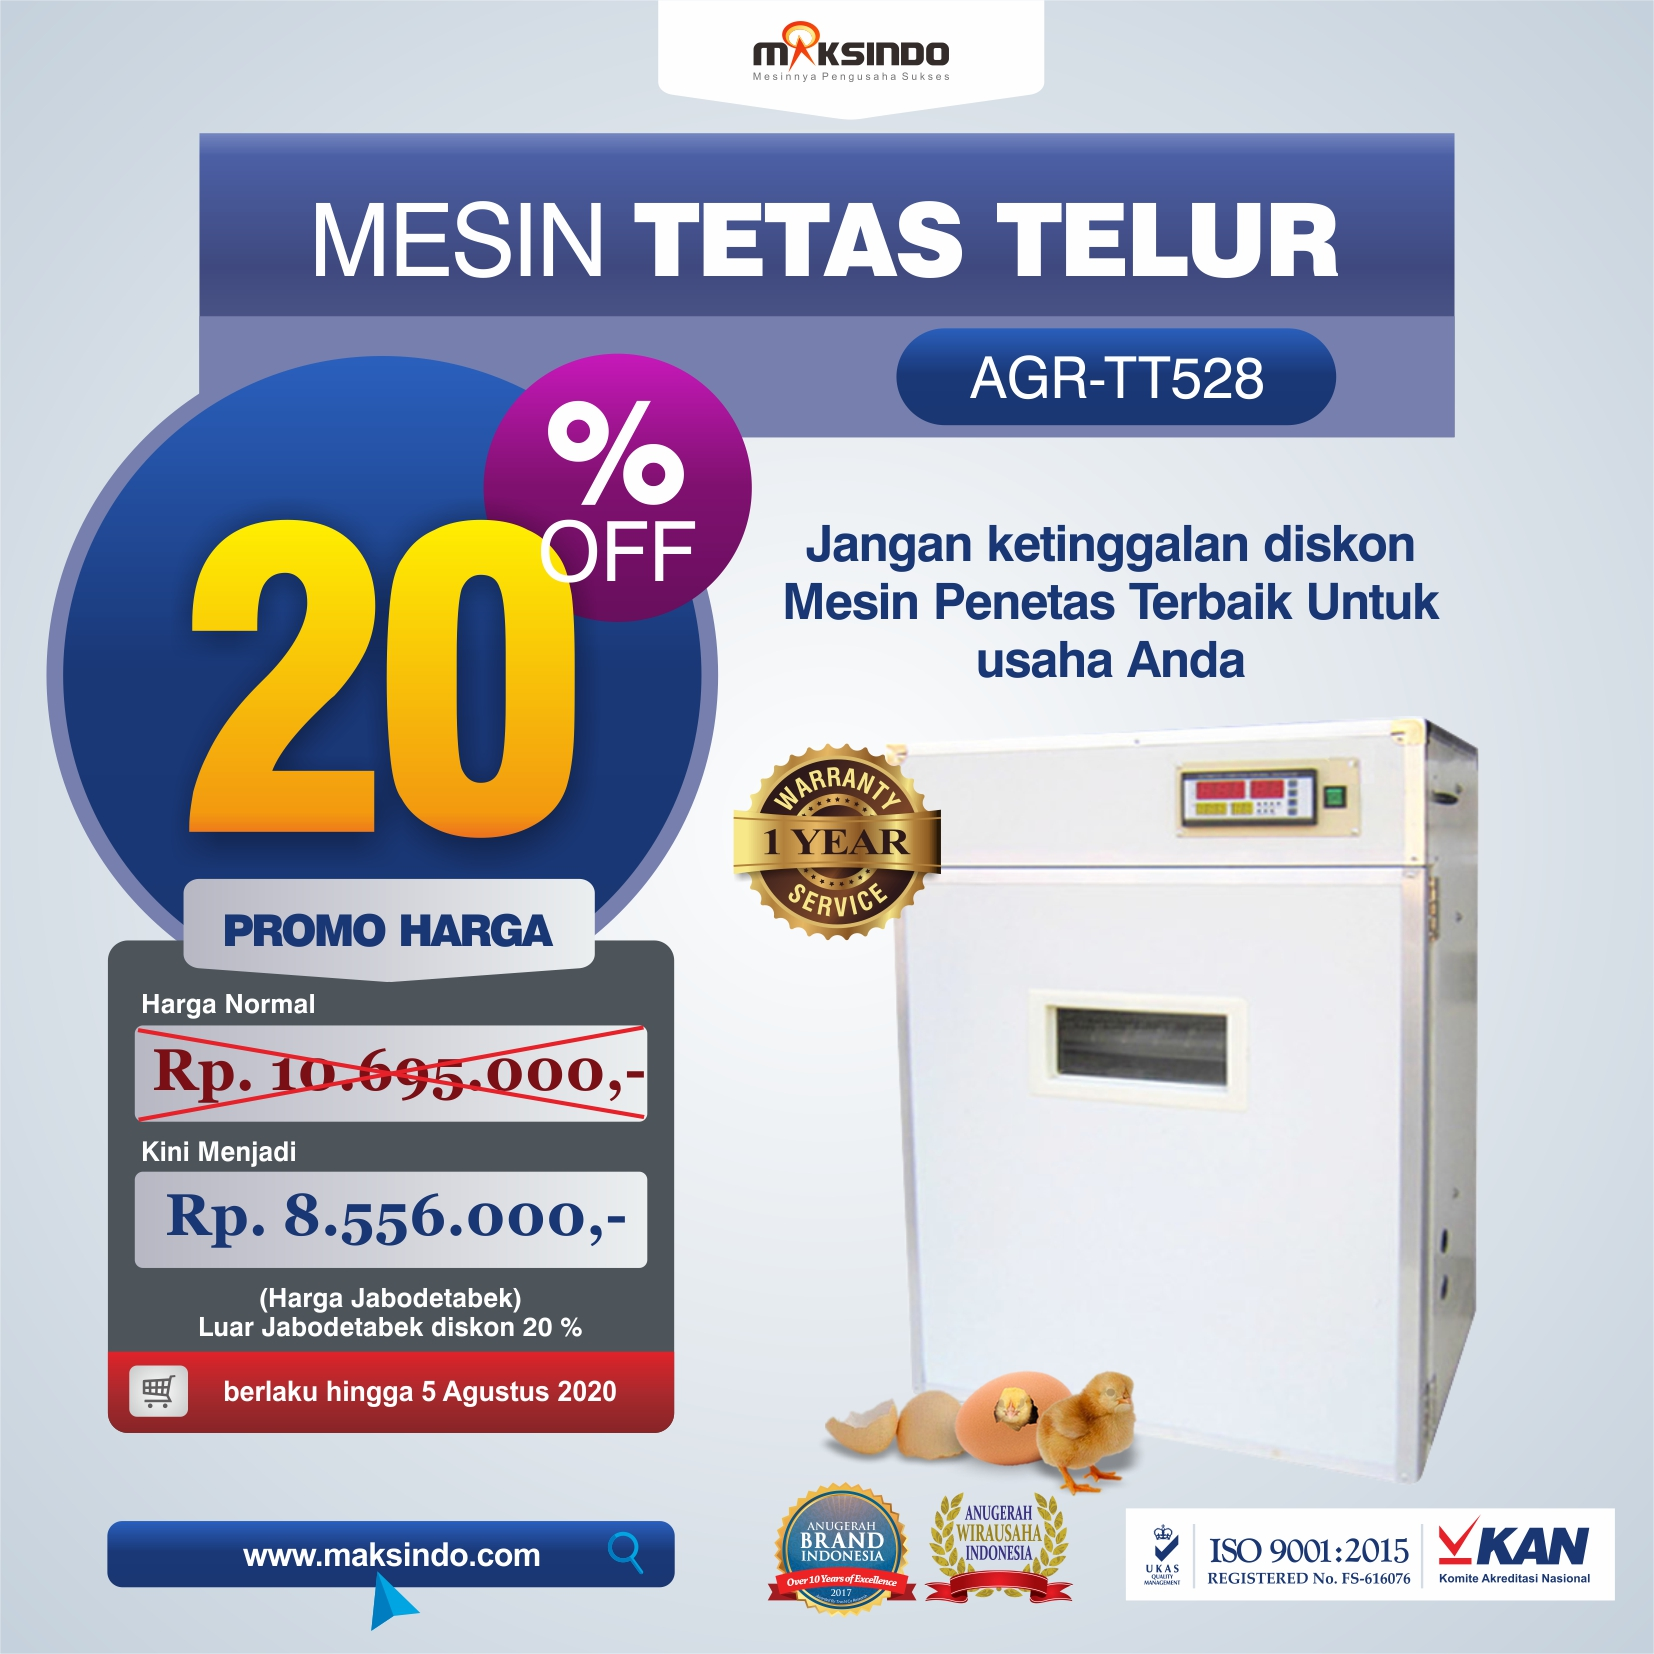 AGR-TT528 MESIN TETAS TELUR